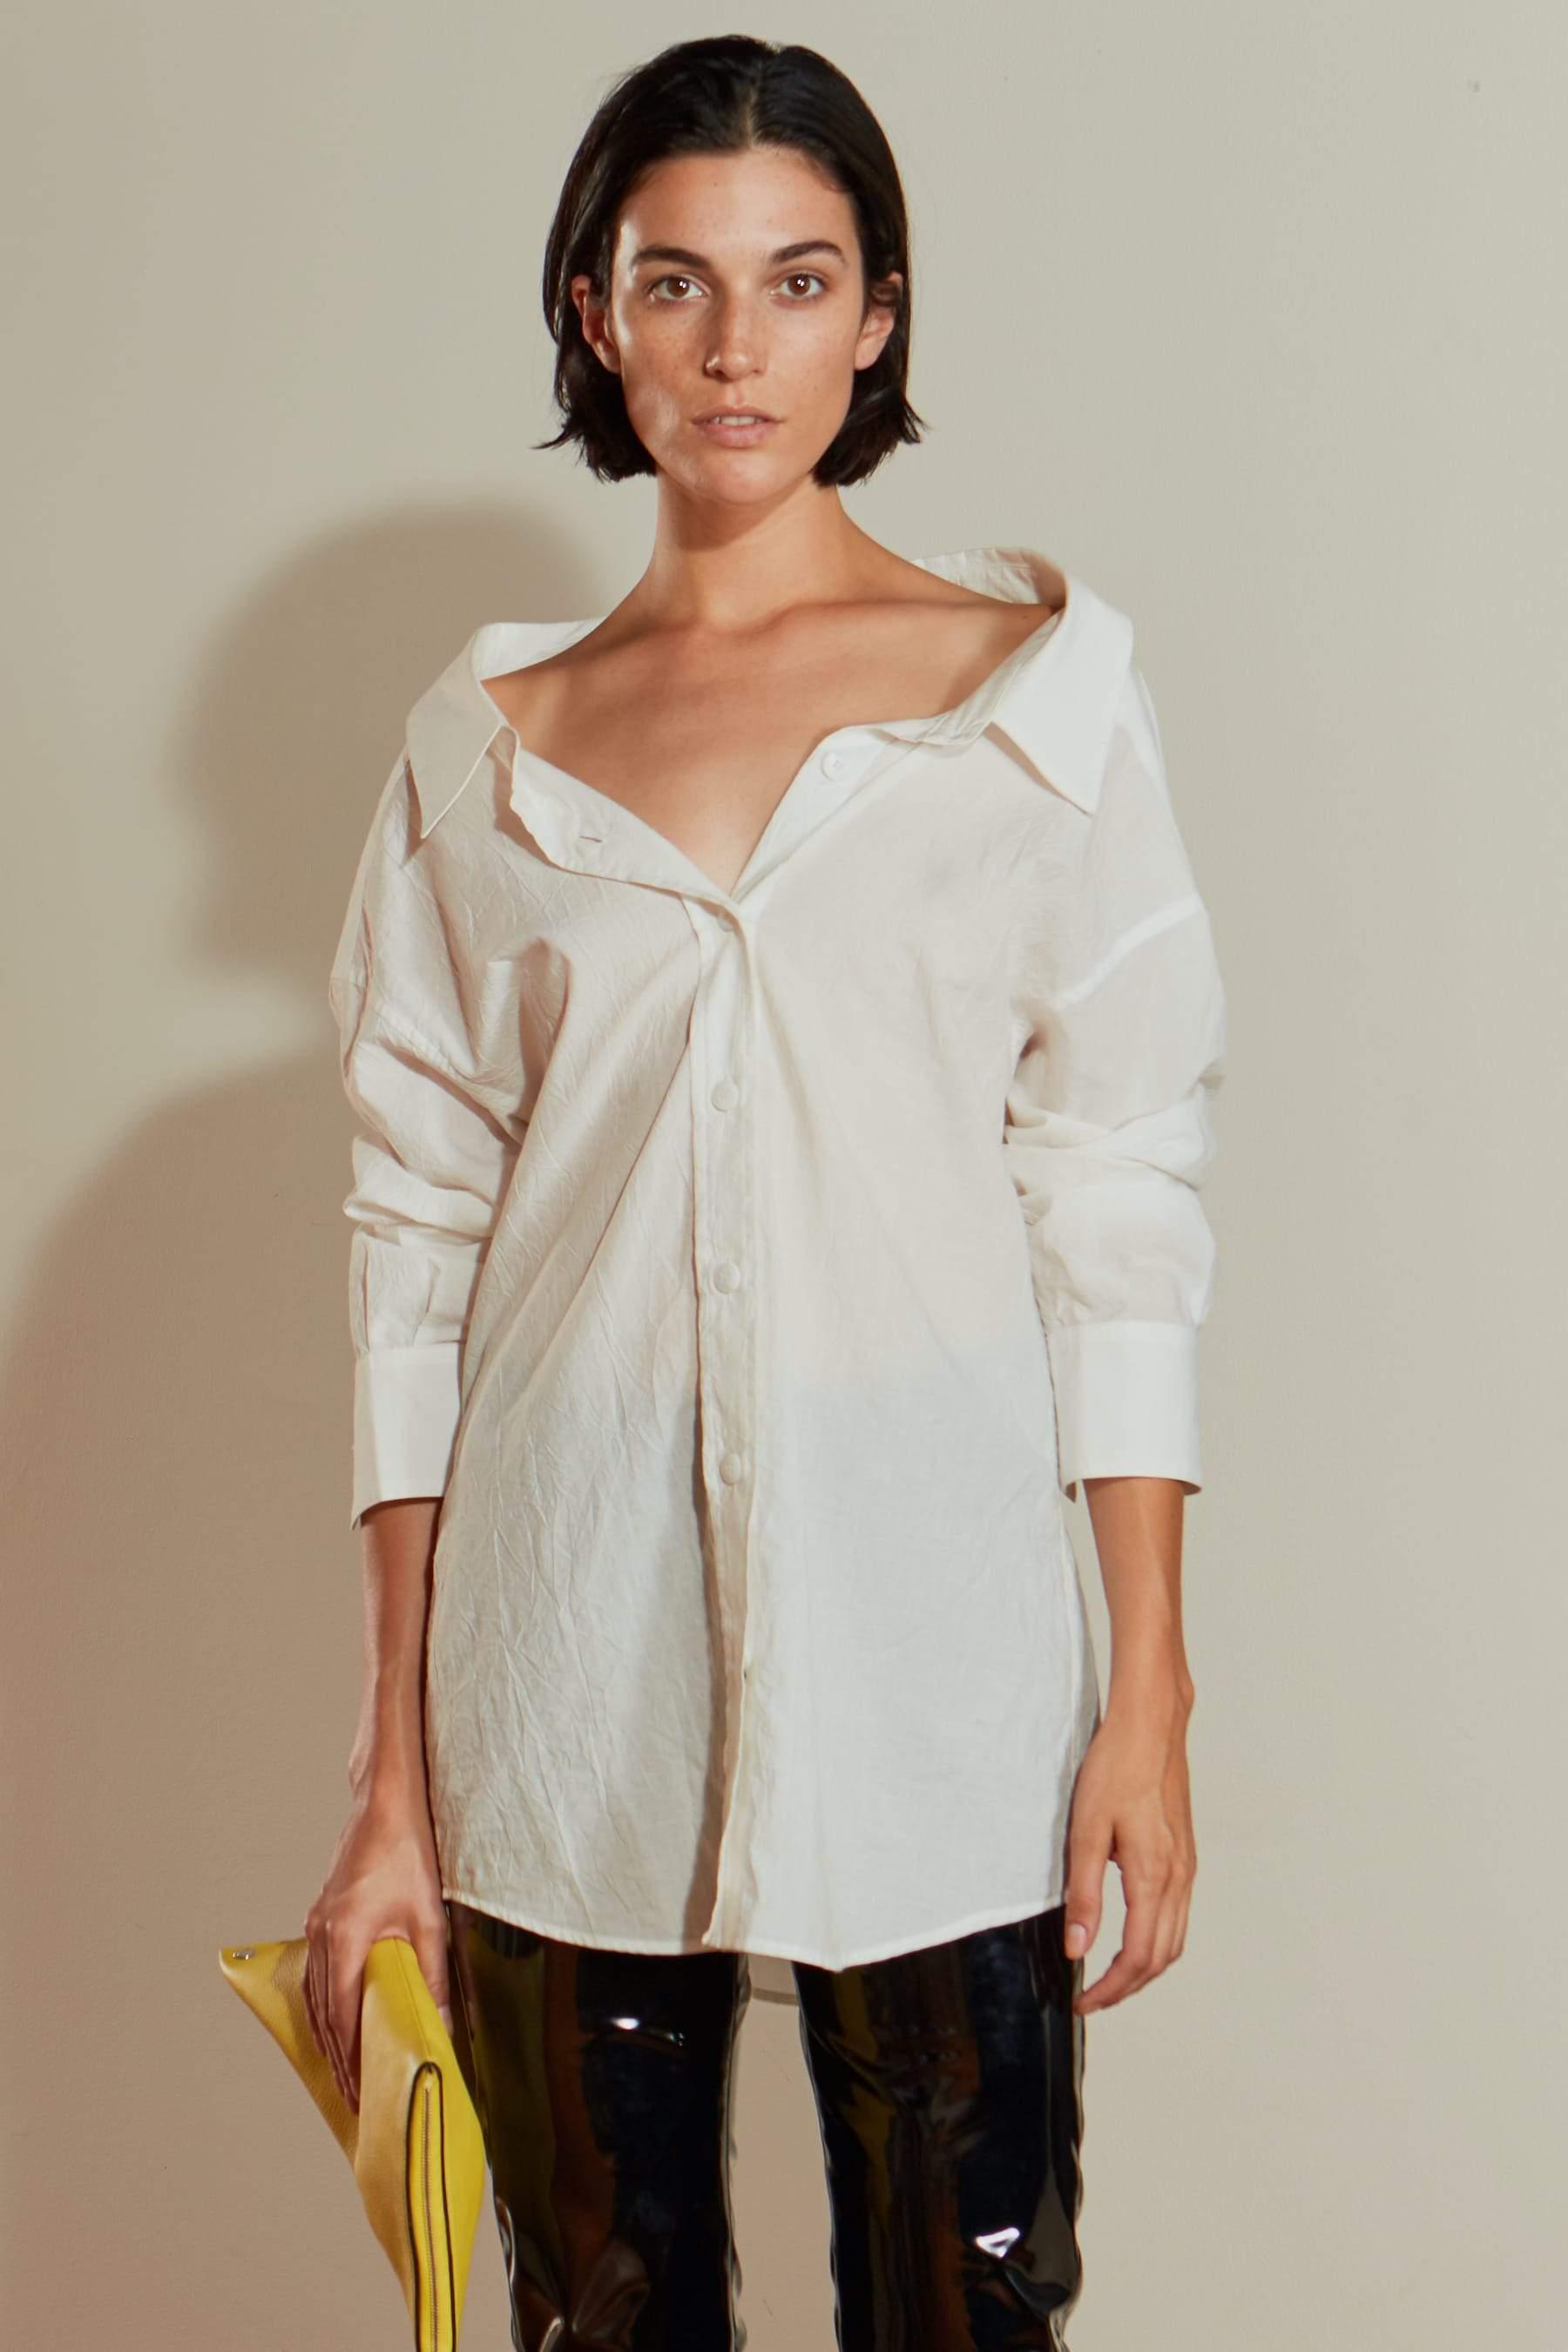 Tabor Shirt in White by Simon Miller - 2